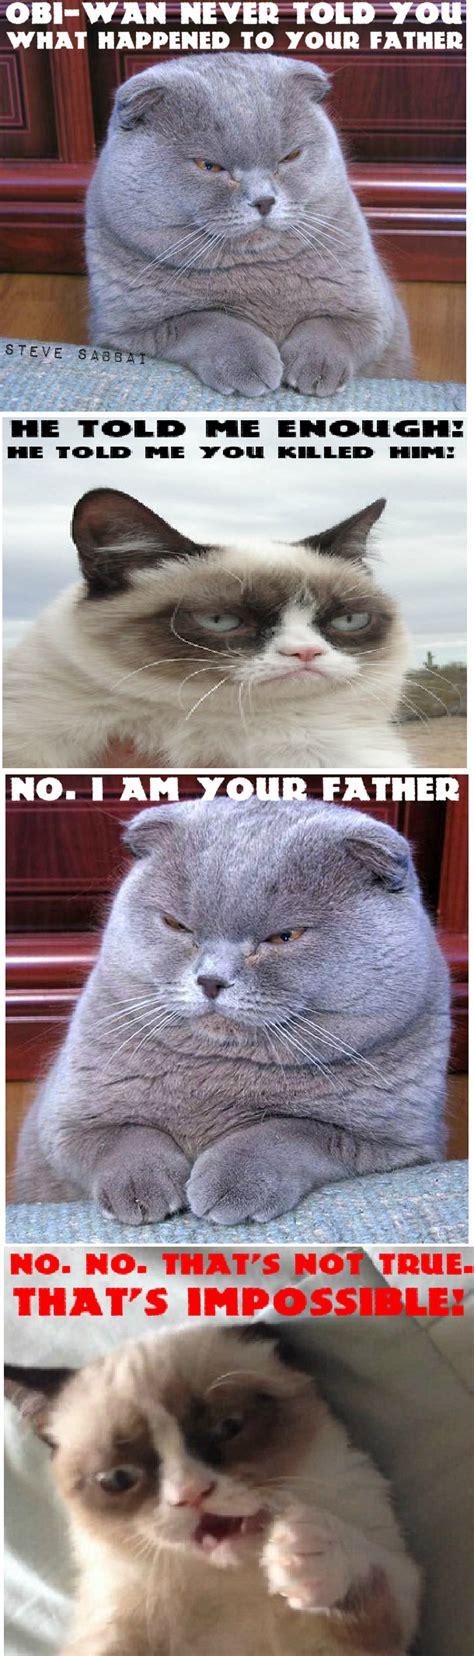 Grumpy Cats Father Vader Empire Star Wars Memes Grumpy